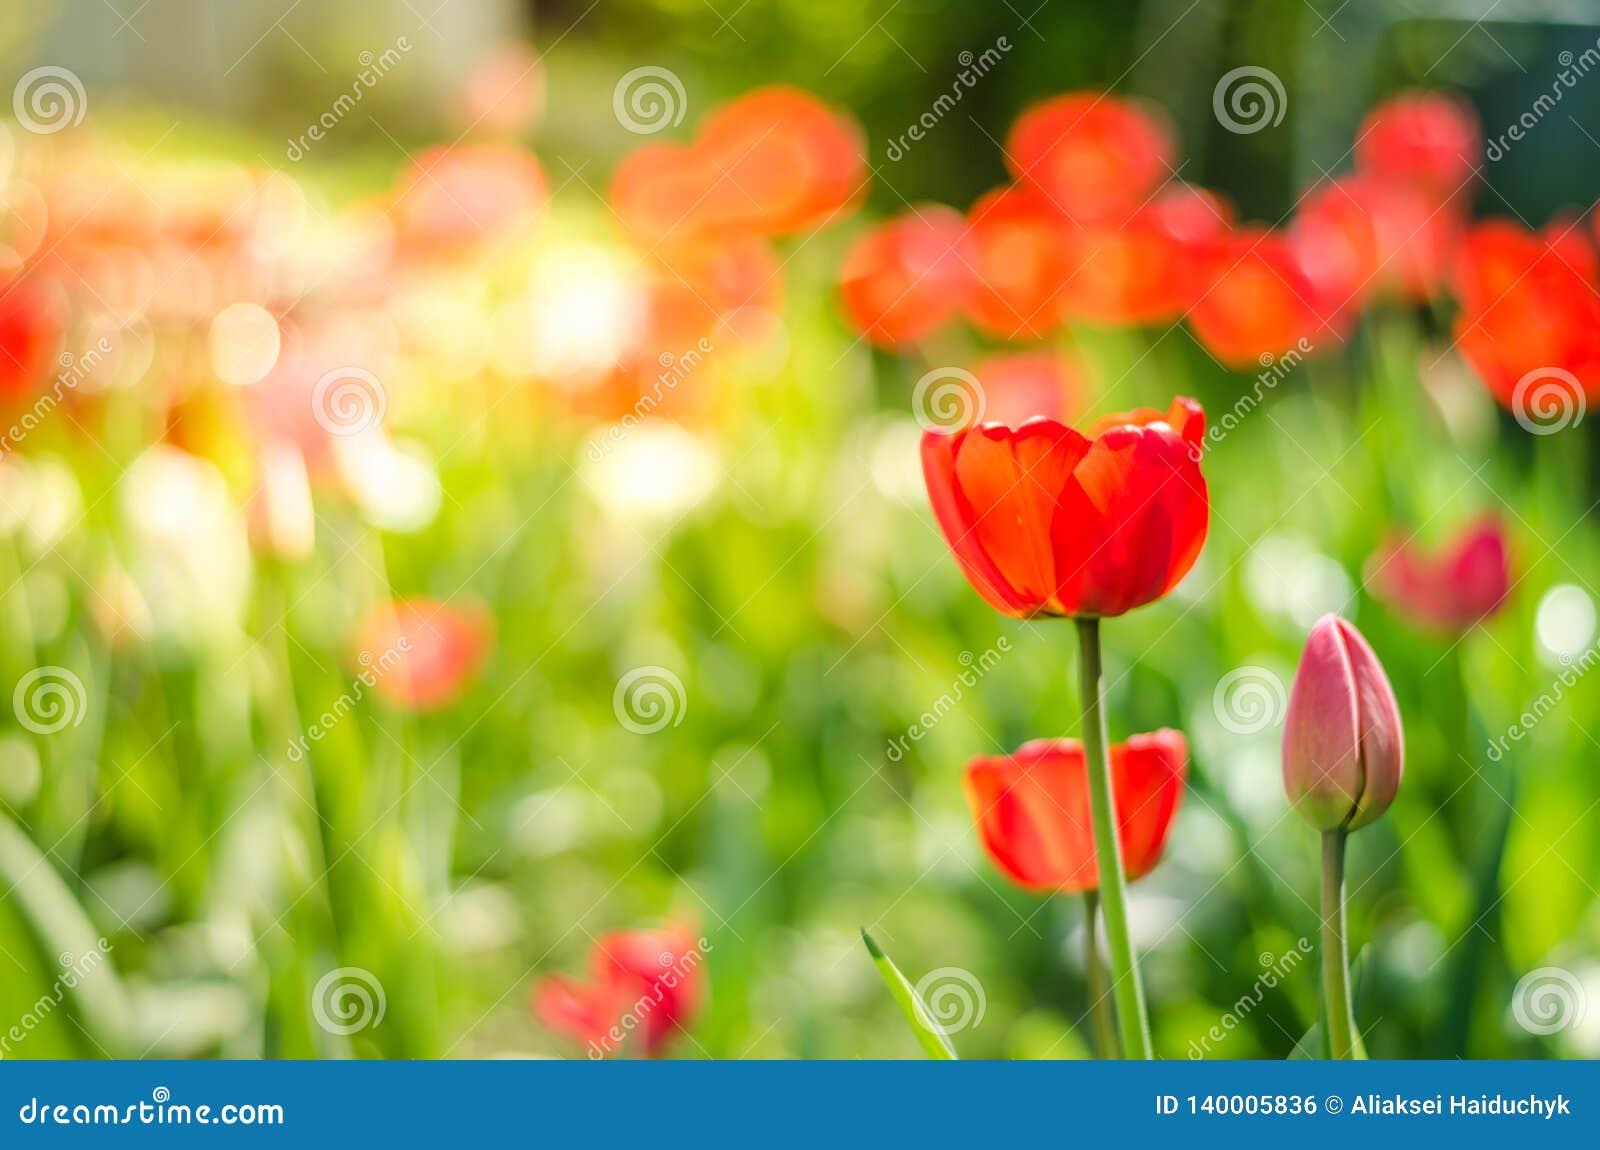 Beautiful nature scene with blooming tulip in sun flare /Beautiful meadow. Field flowers tulip